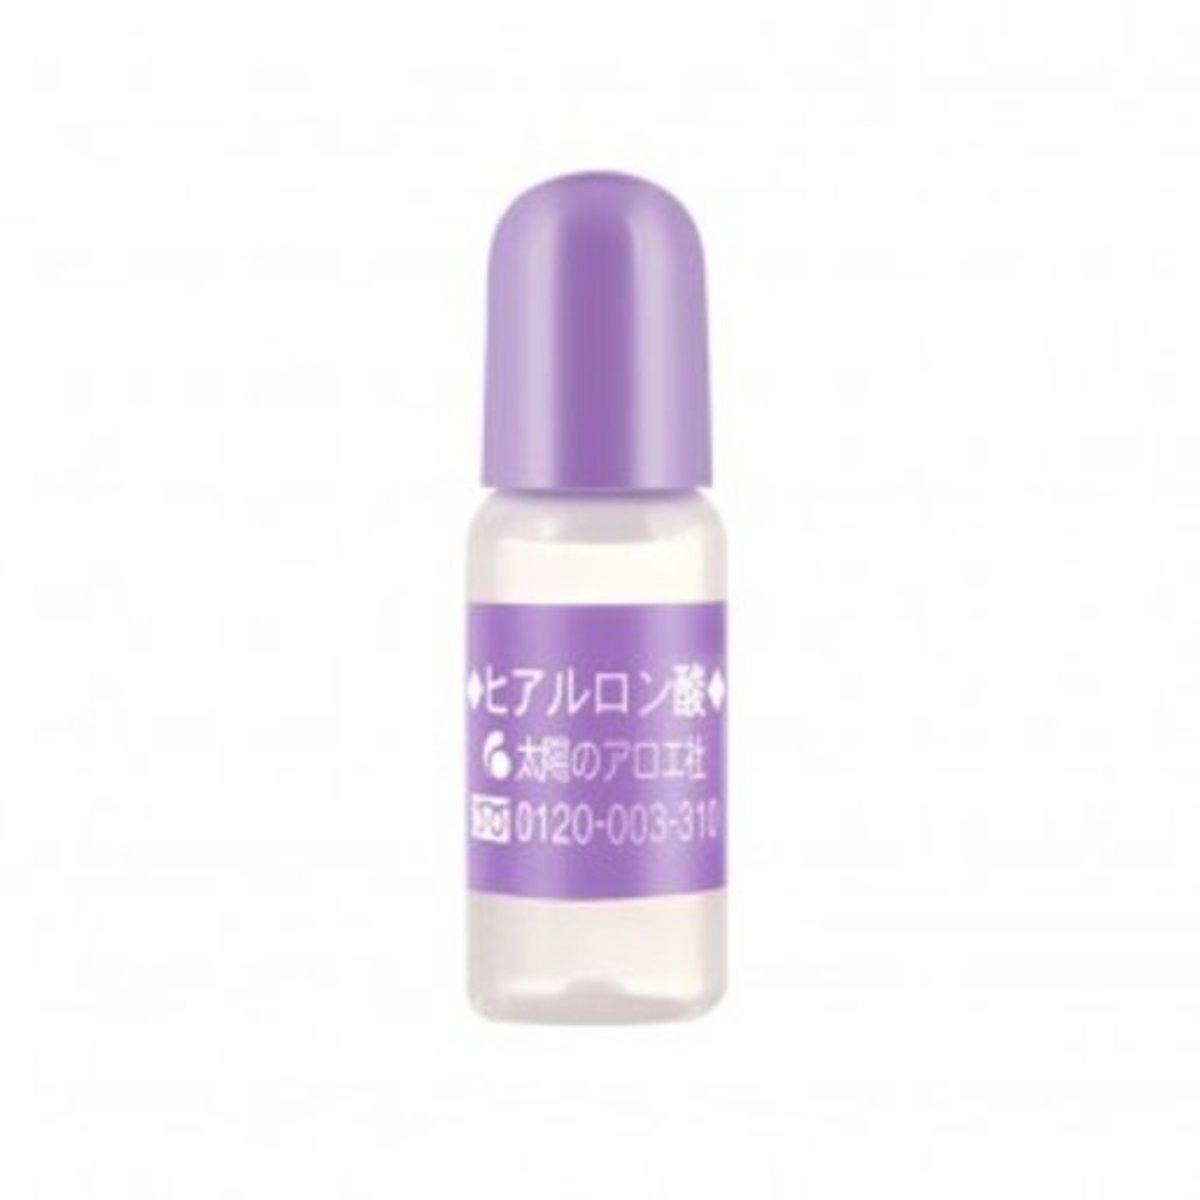 Hyaluronic Acids 10ml (4562270778103) (parallel import goods)